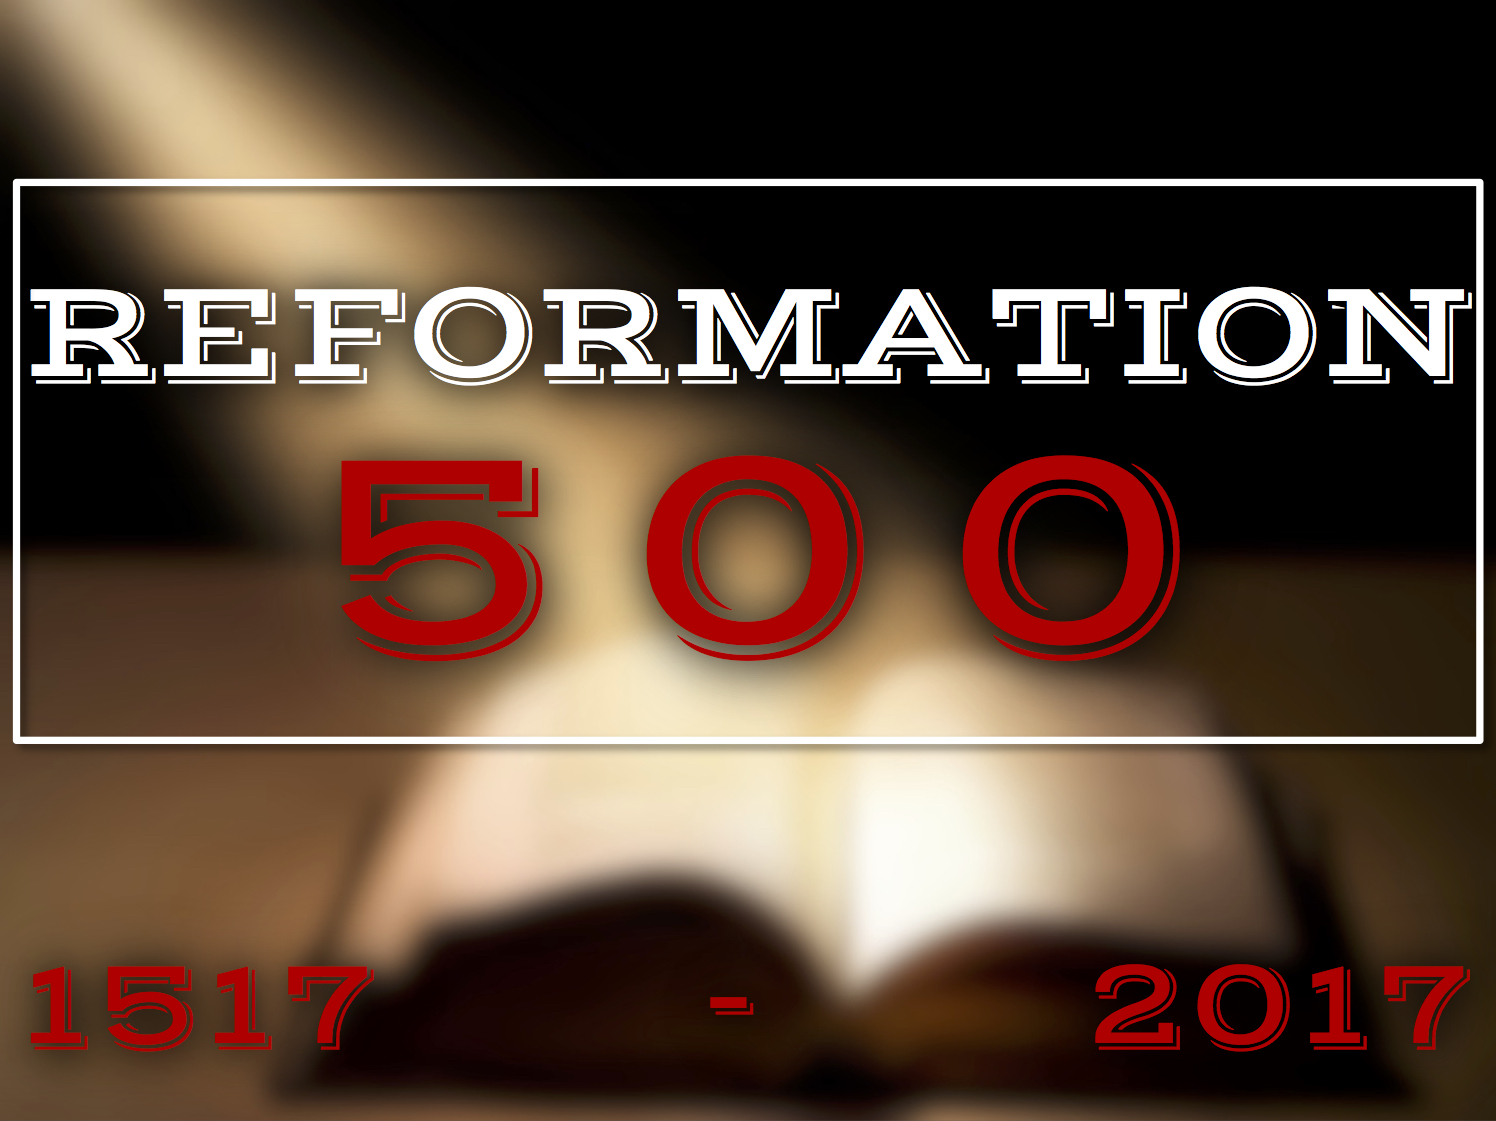 Reformation 2 JPEG.jpg